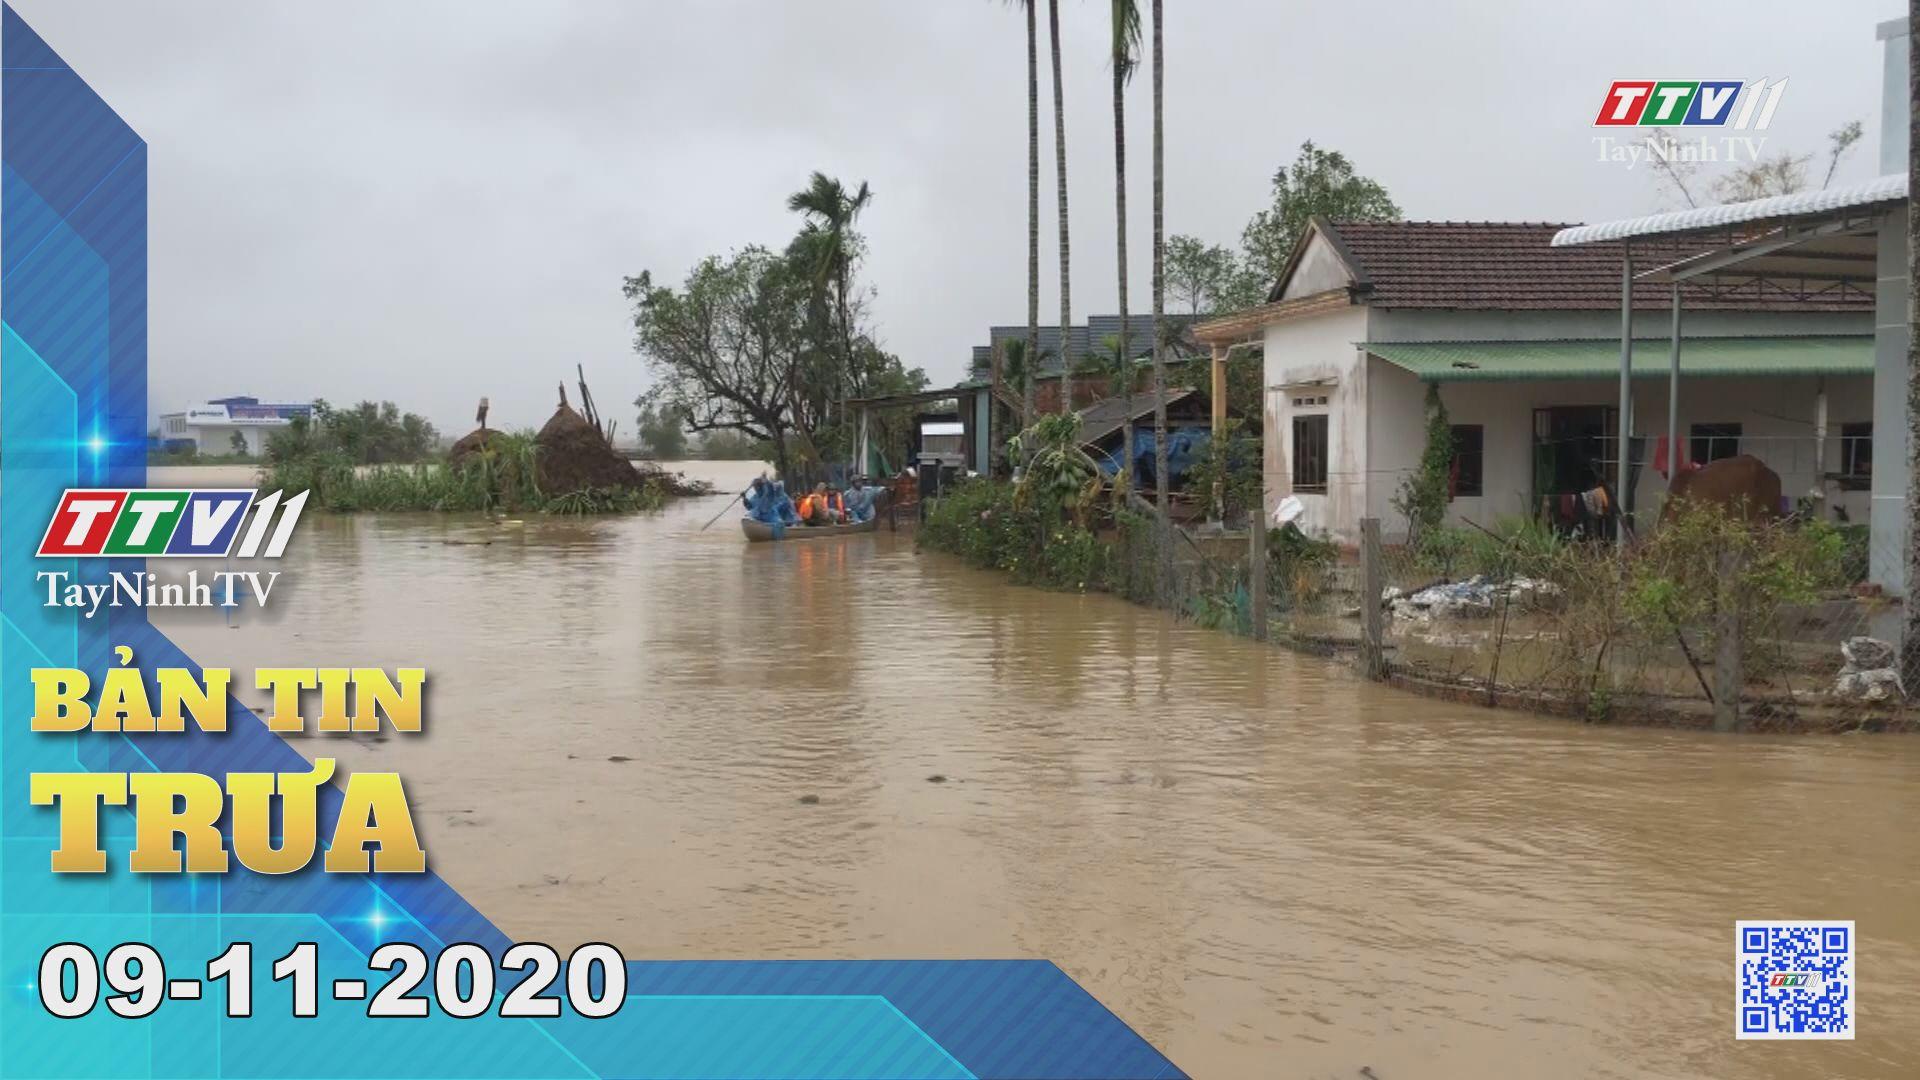 Bản tin trưa 09-11-2020 | Tin tức hôm nay | TayNinhTV